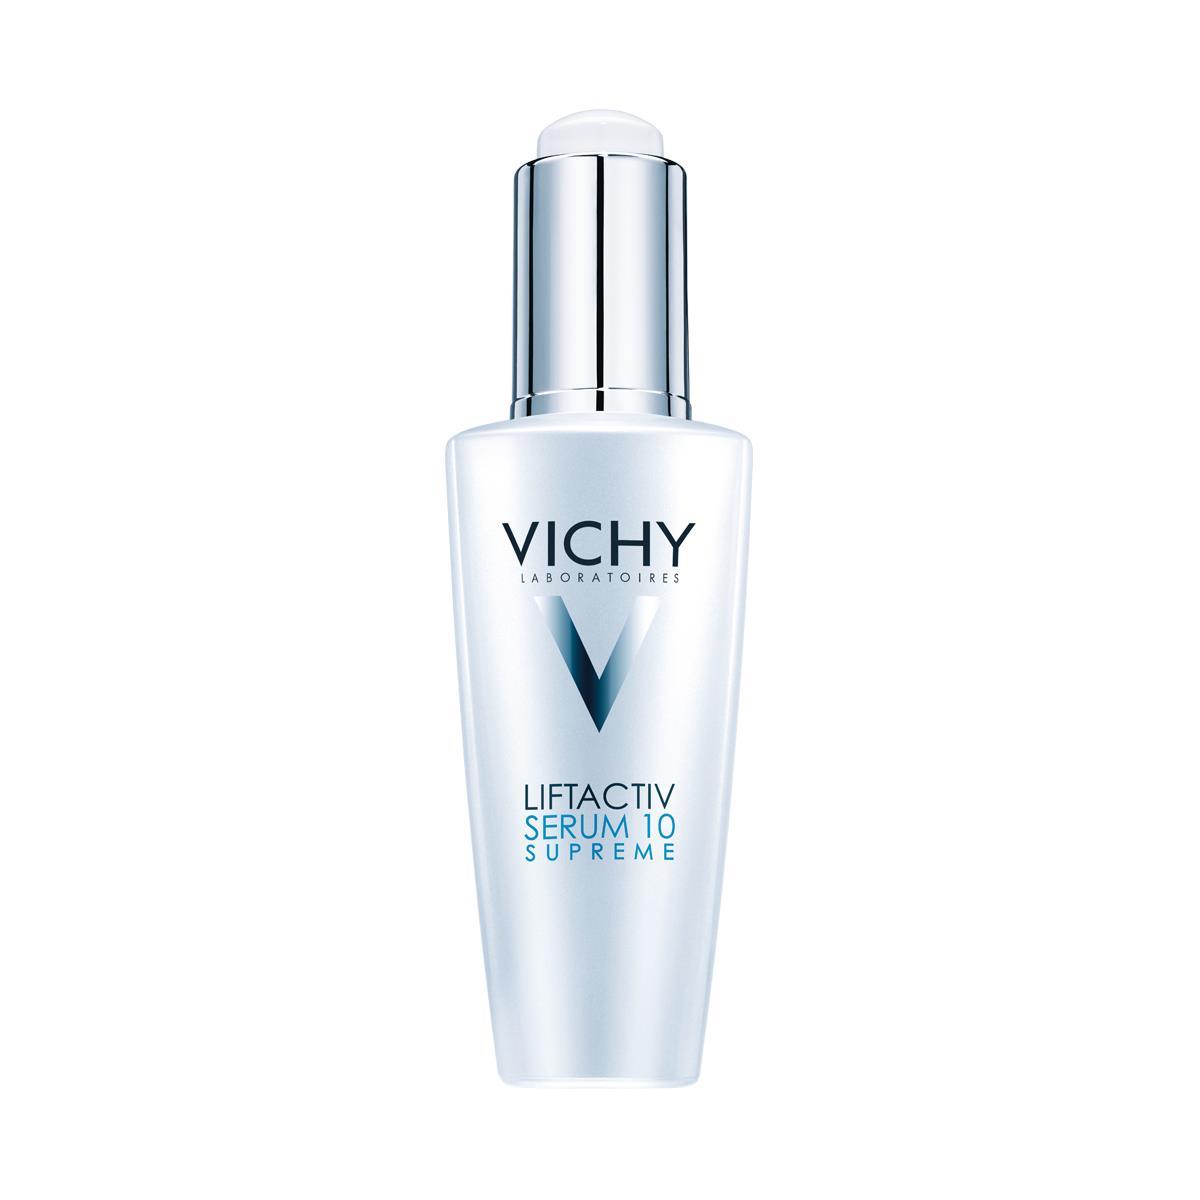 Vichy Liftactive 10 Supreme 1 Frasco Liquido 50 Ml